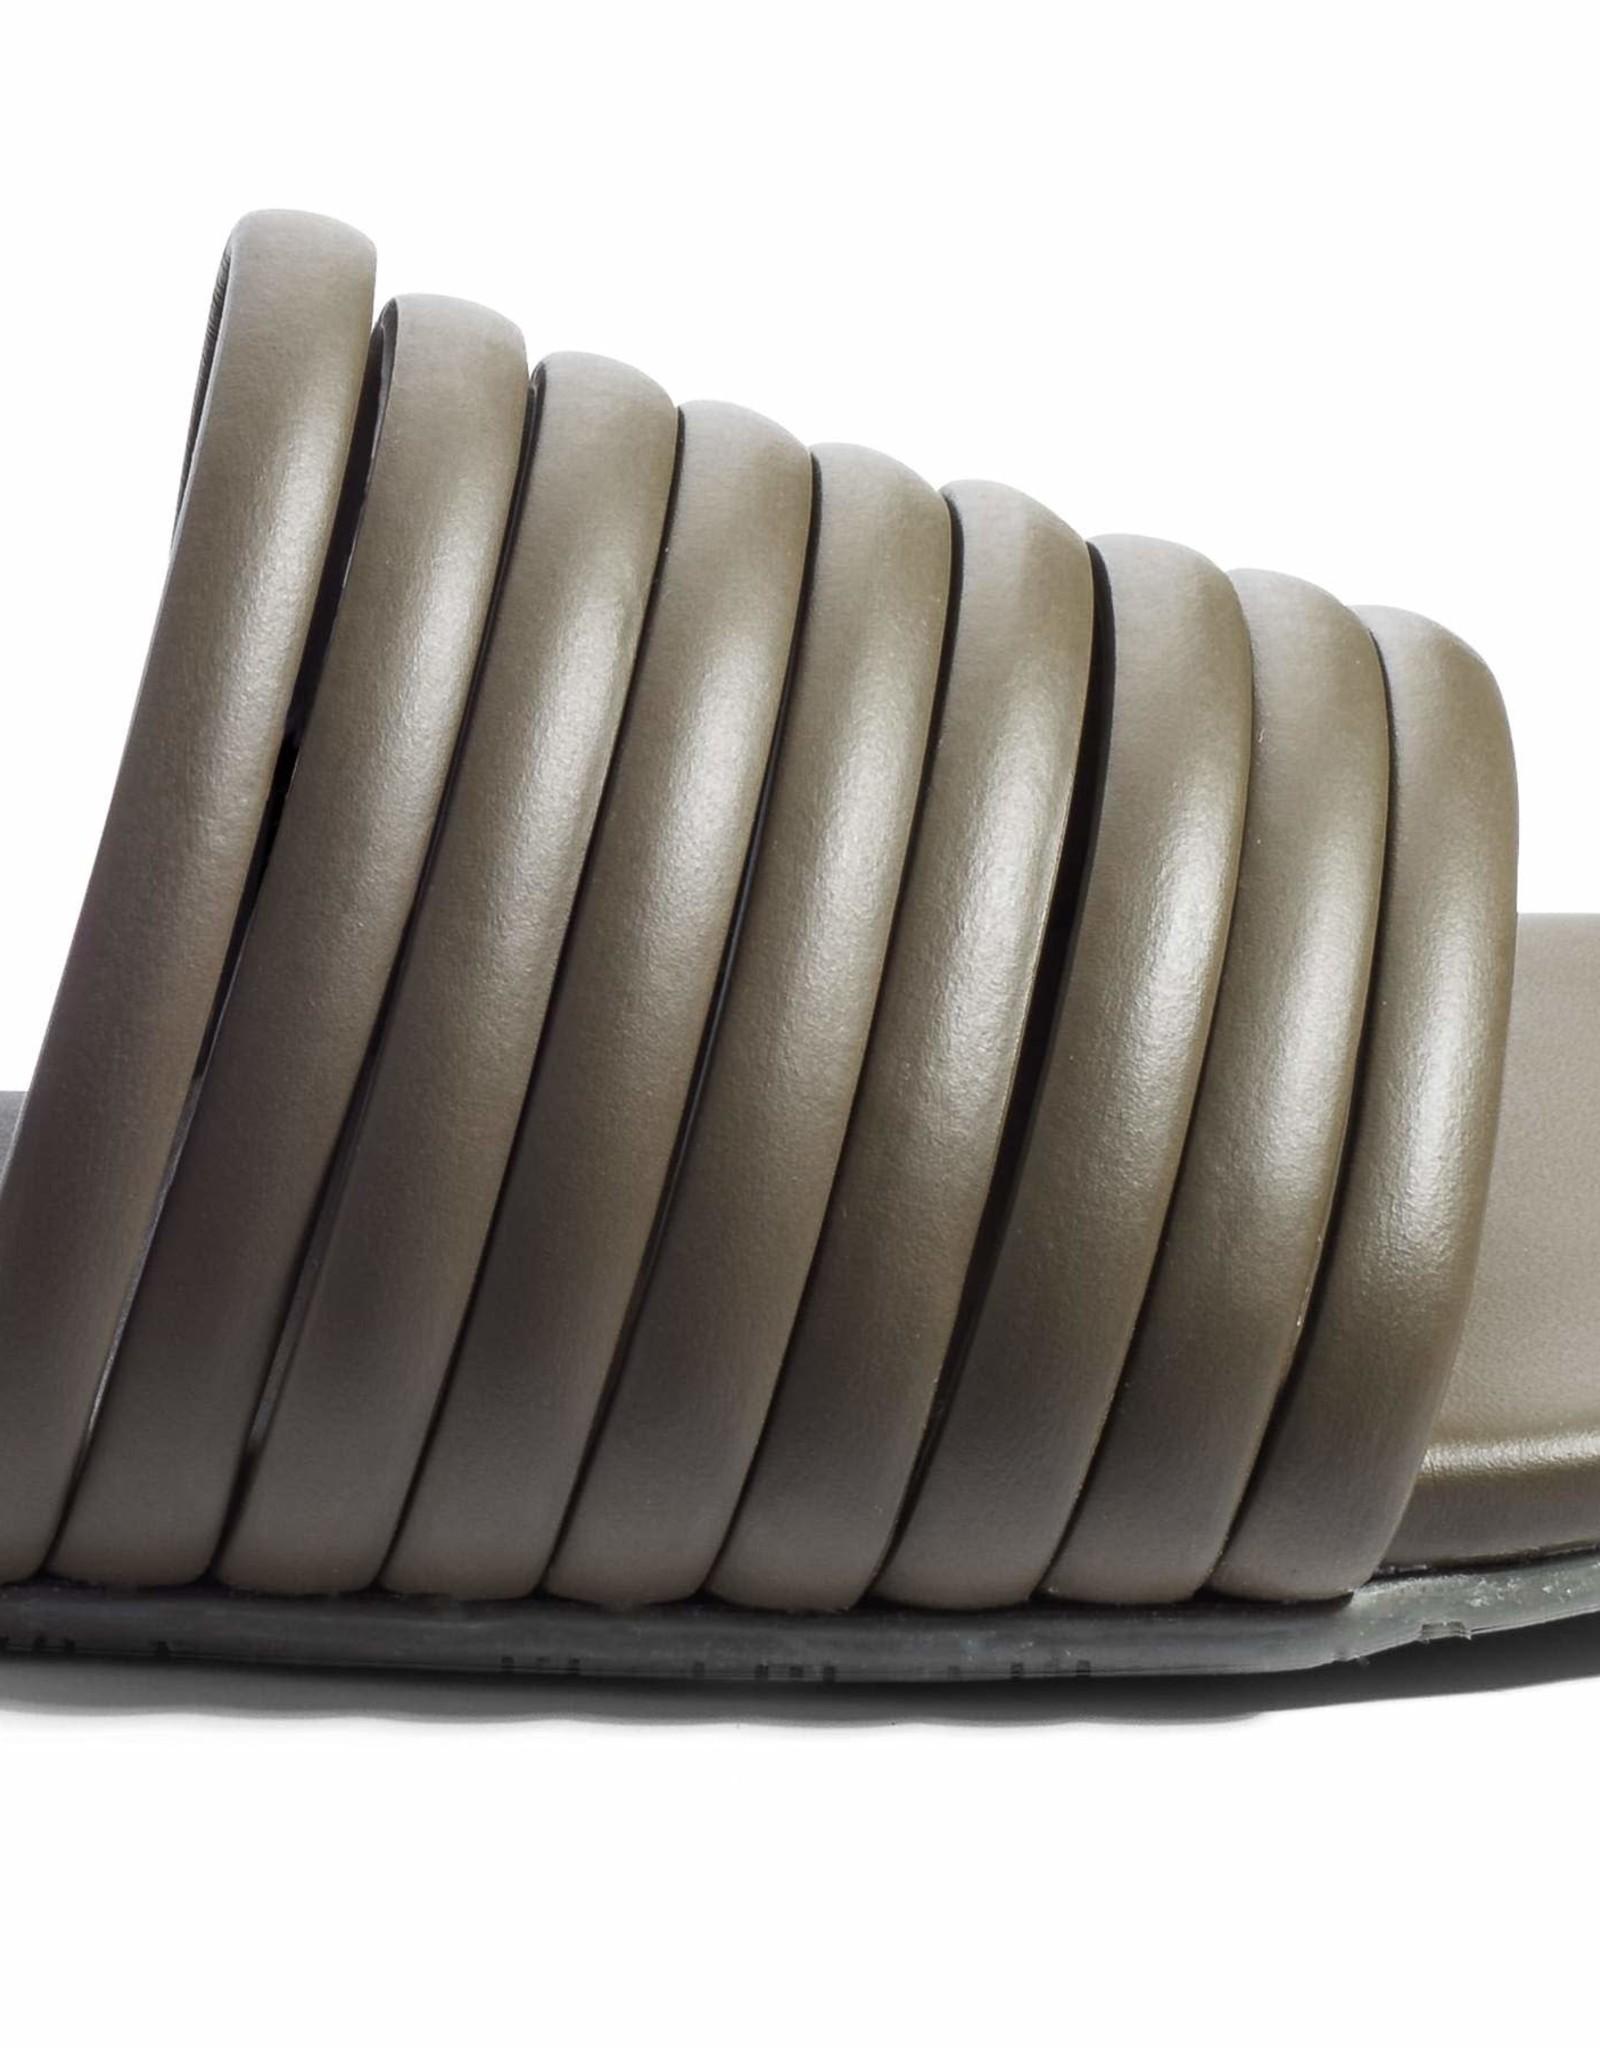 Tkees Caro Olive Sandals